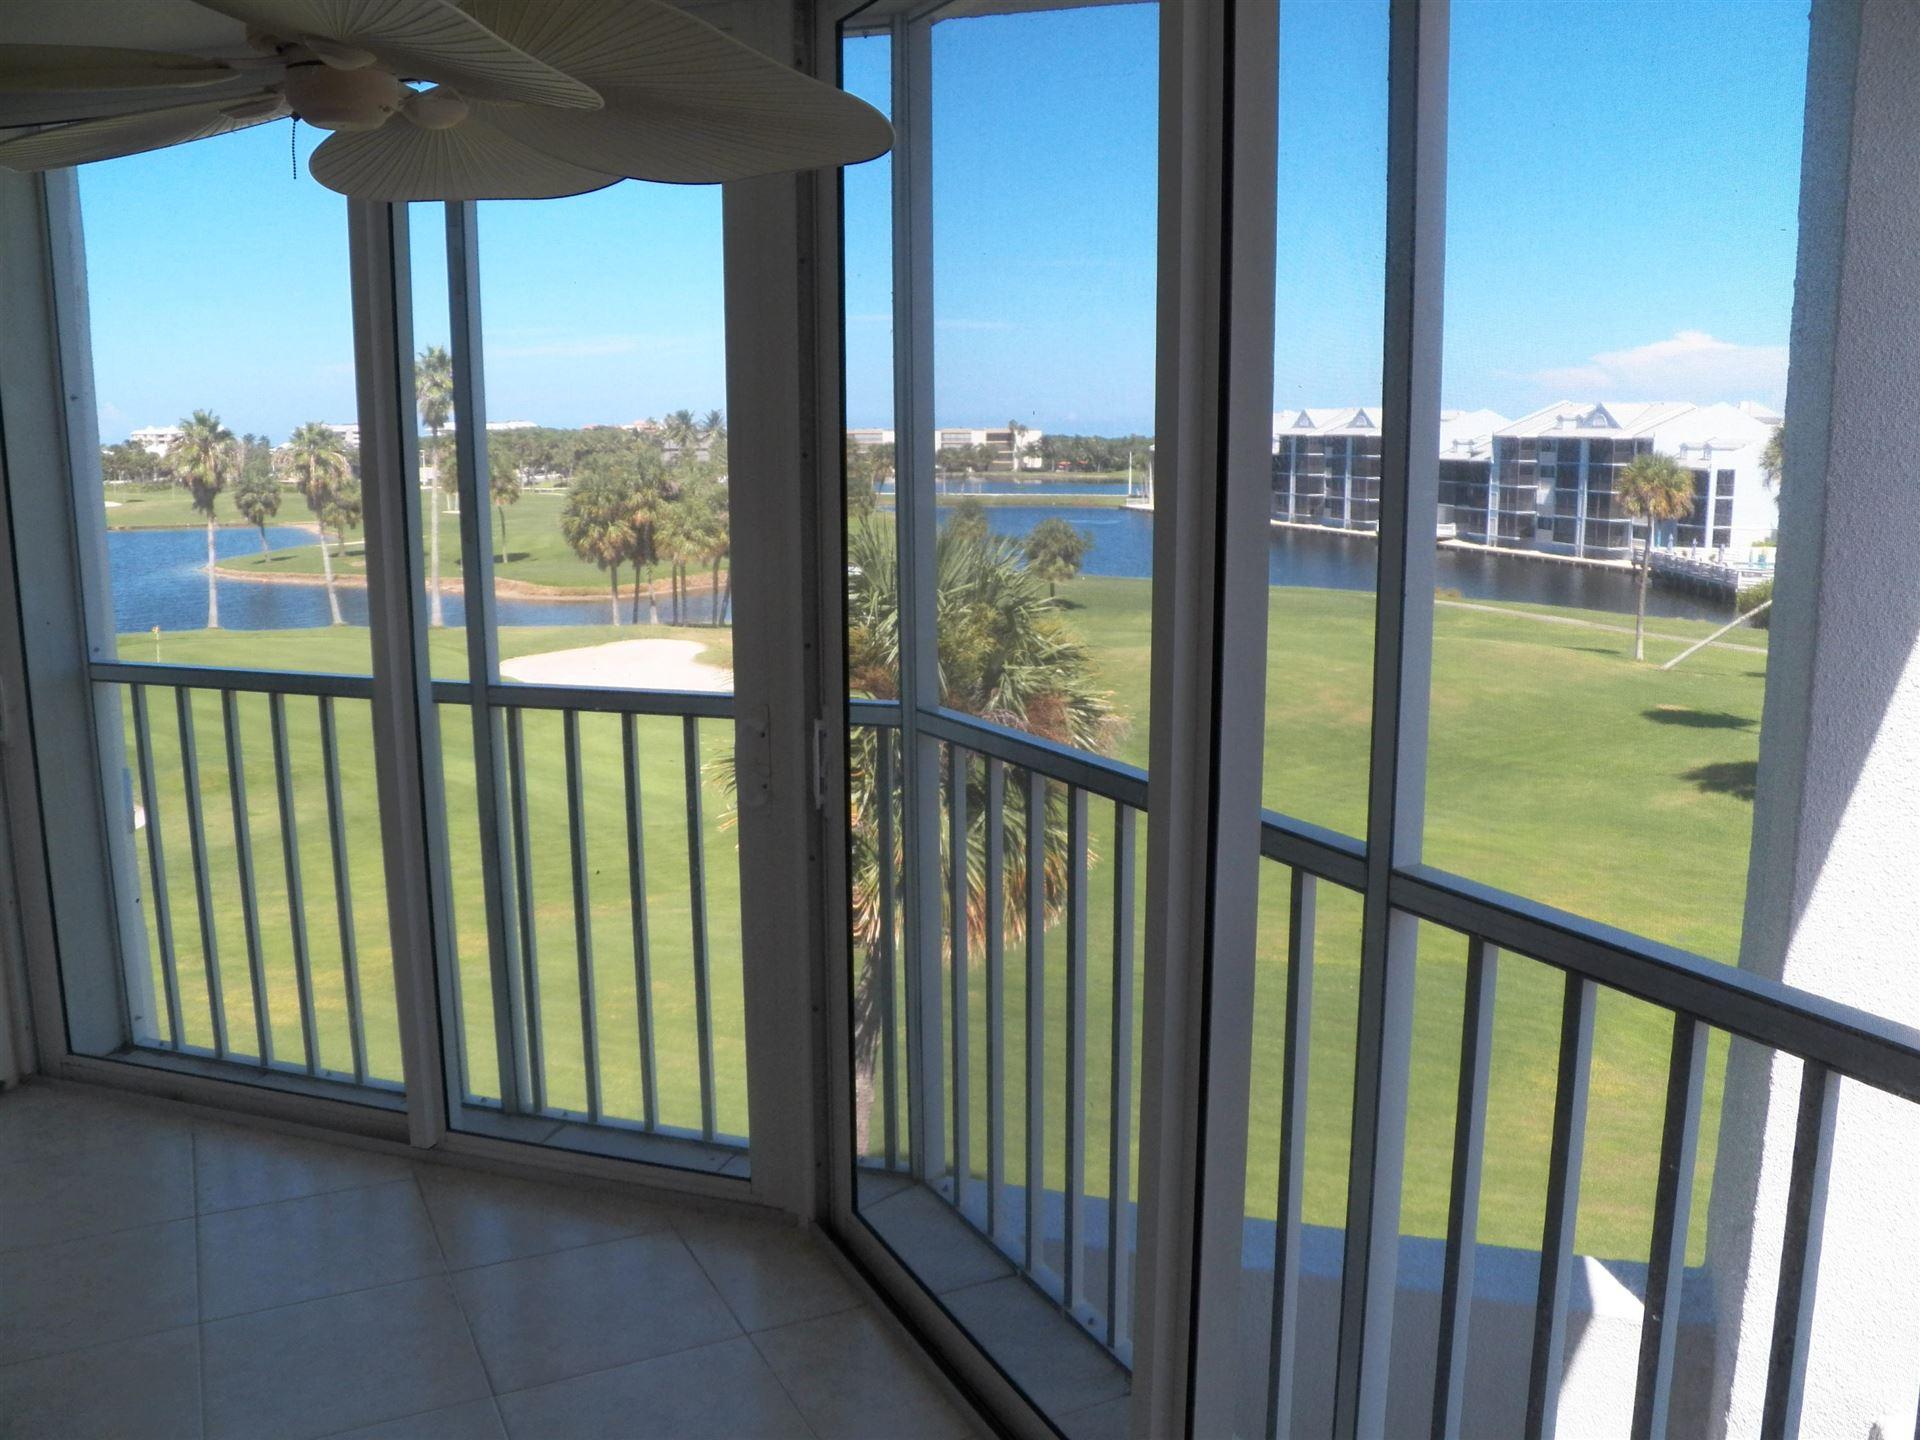 Photo of 145 E Edgewater Drive #4302, Stuart, FL 34994 (MLS # RX-10645826)